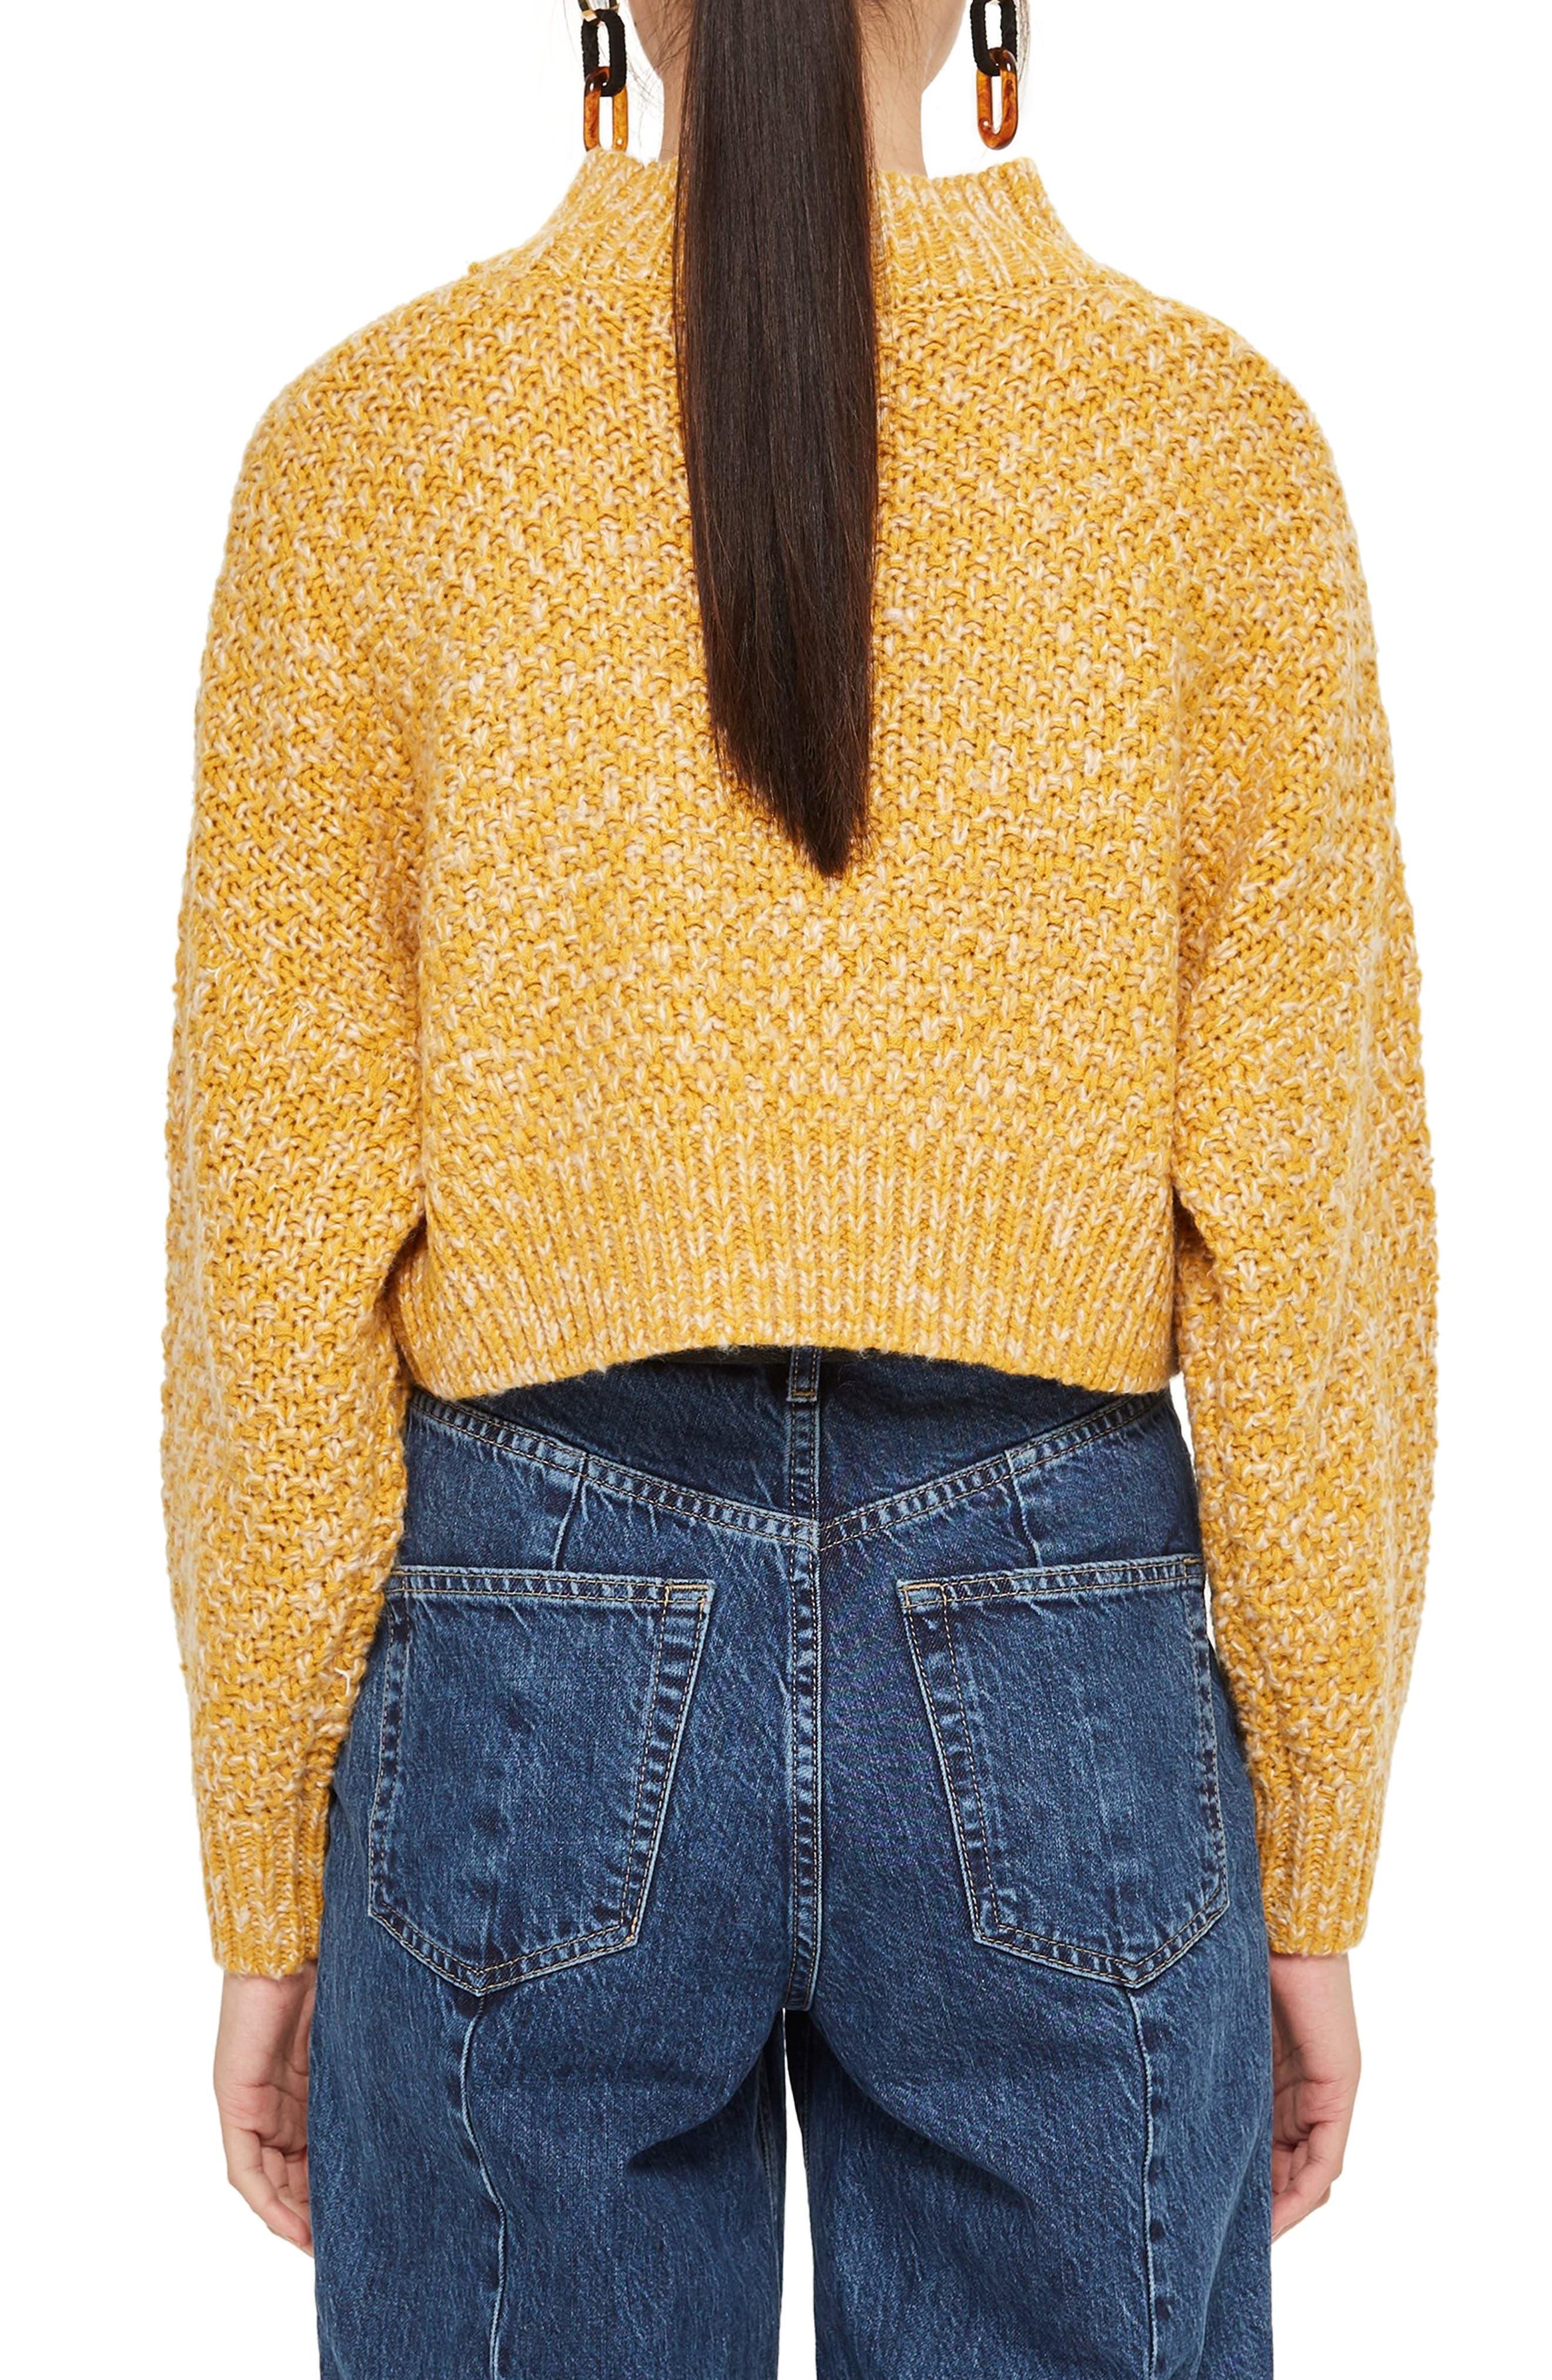 Curve Hem Crop Sweater,                             Alternate thumbnail 2, color,                             MUSTARD